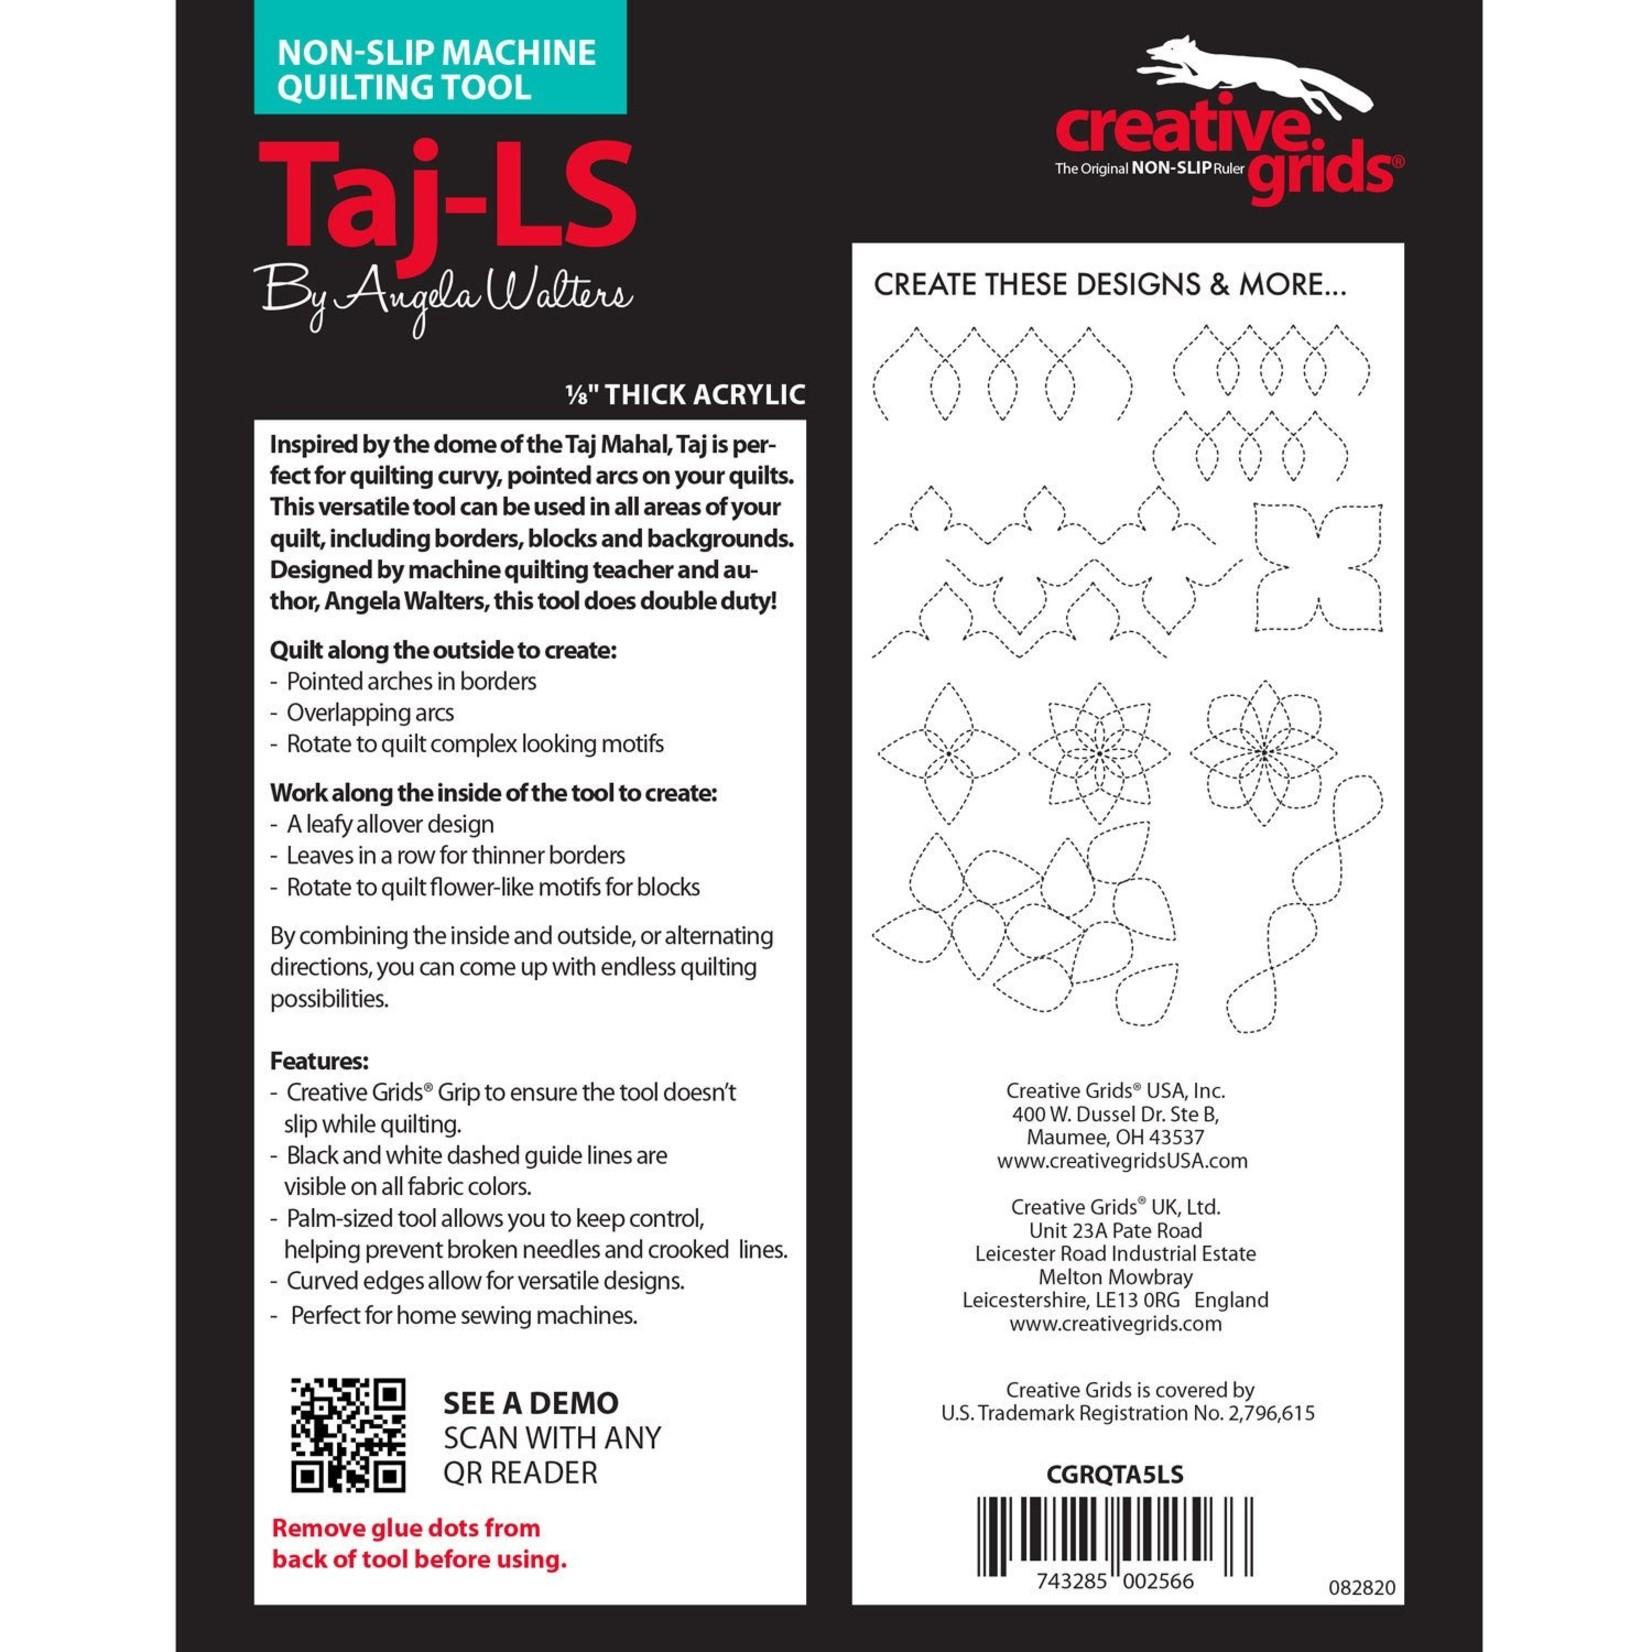 Creative Grids Creative Grids Taj Low Shank Ruler CGRQTA5LS